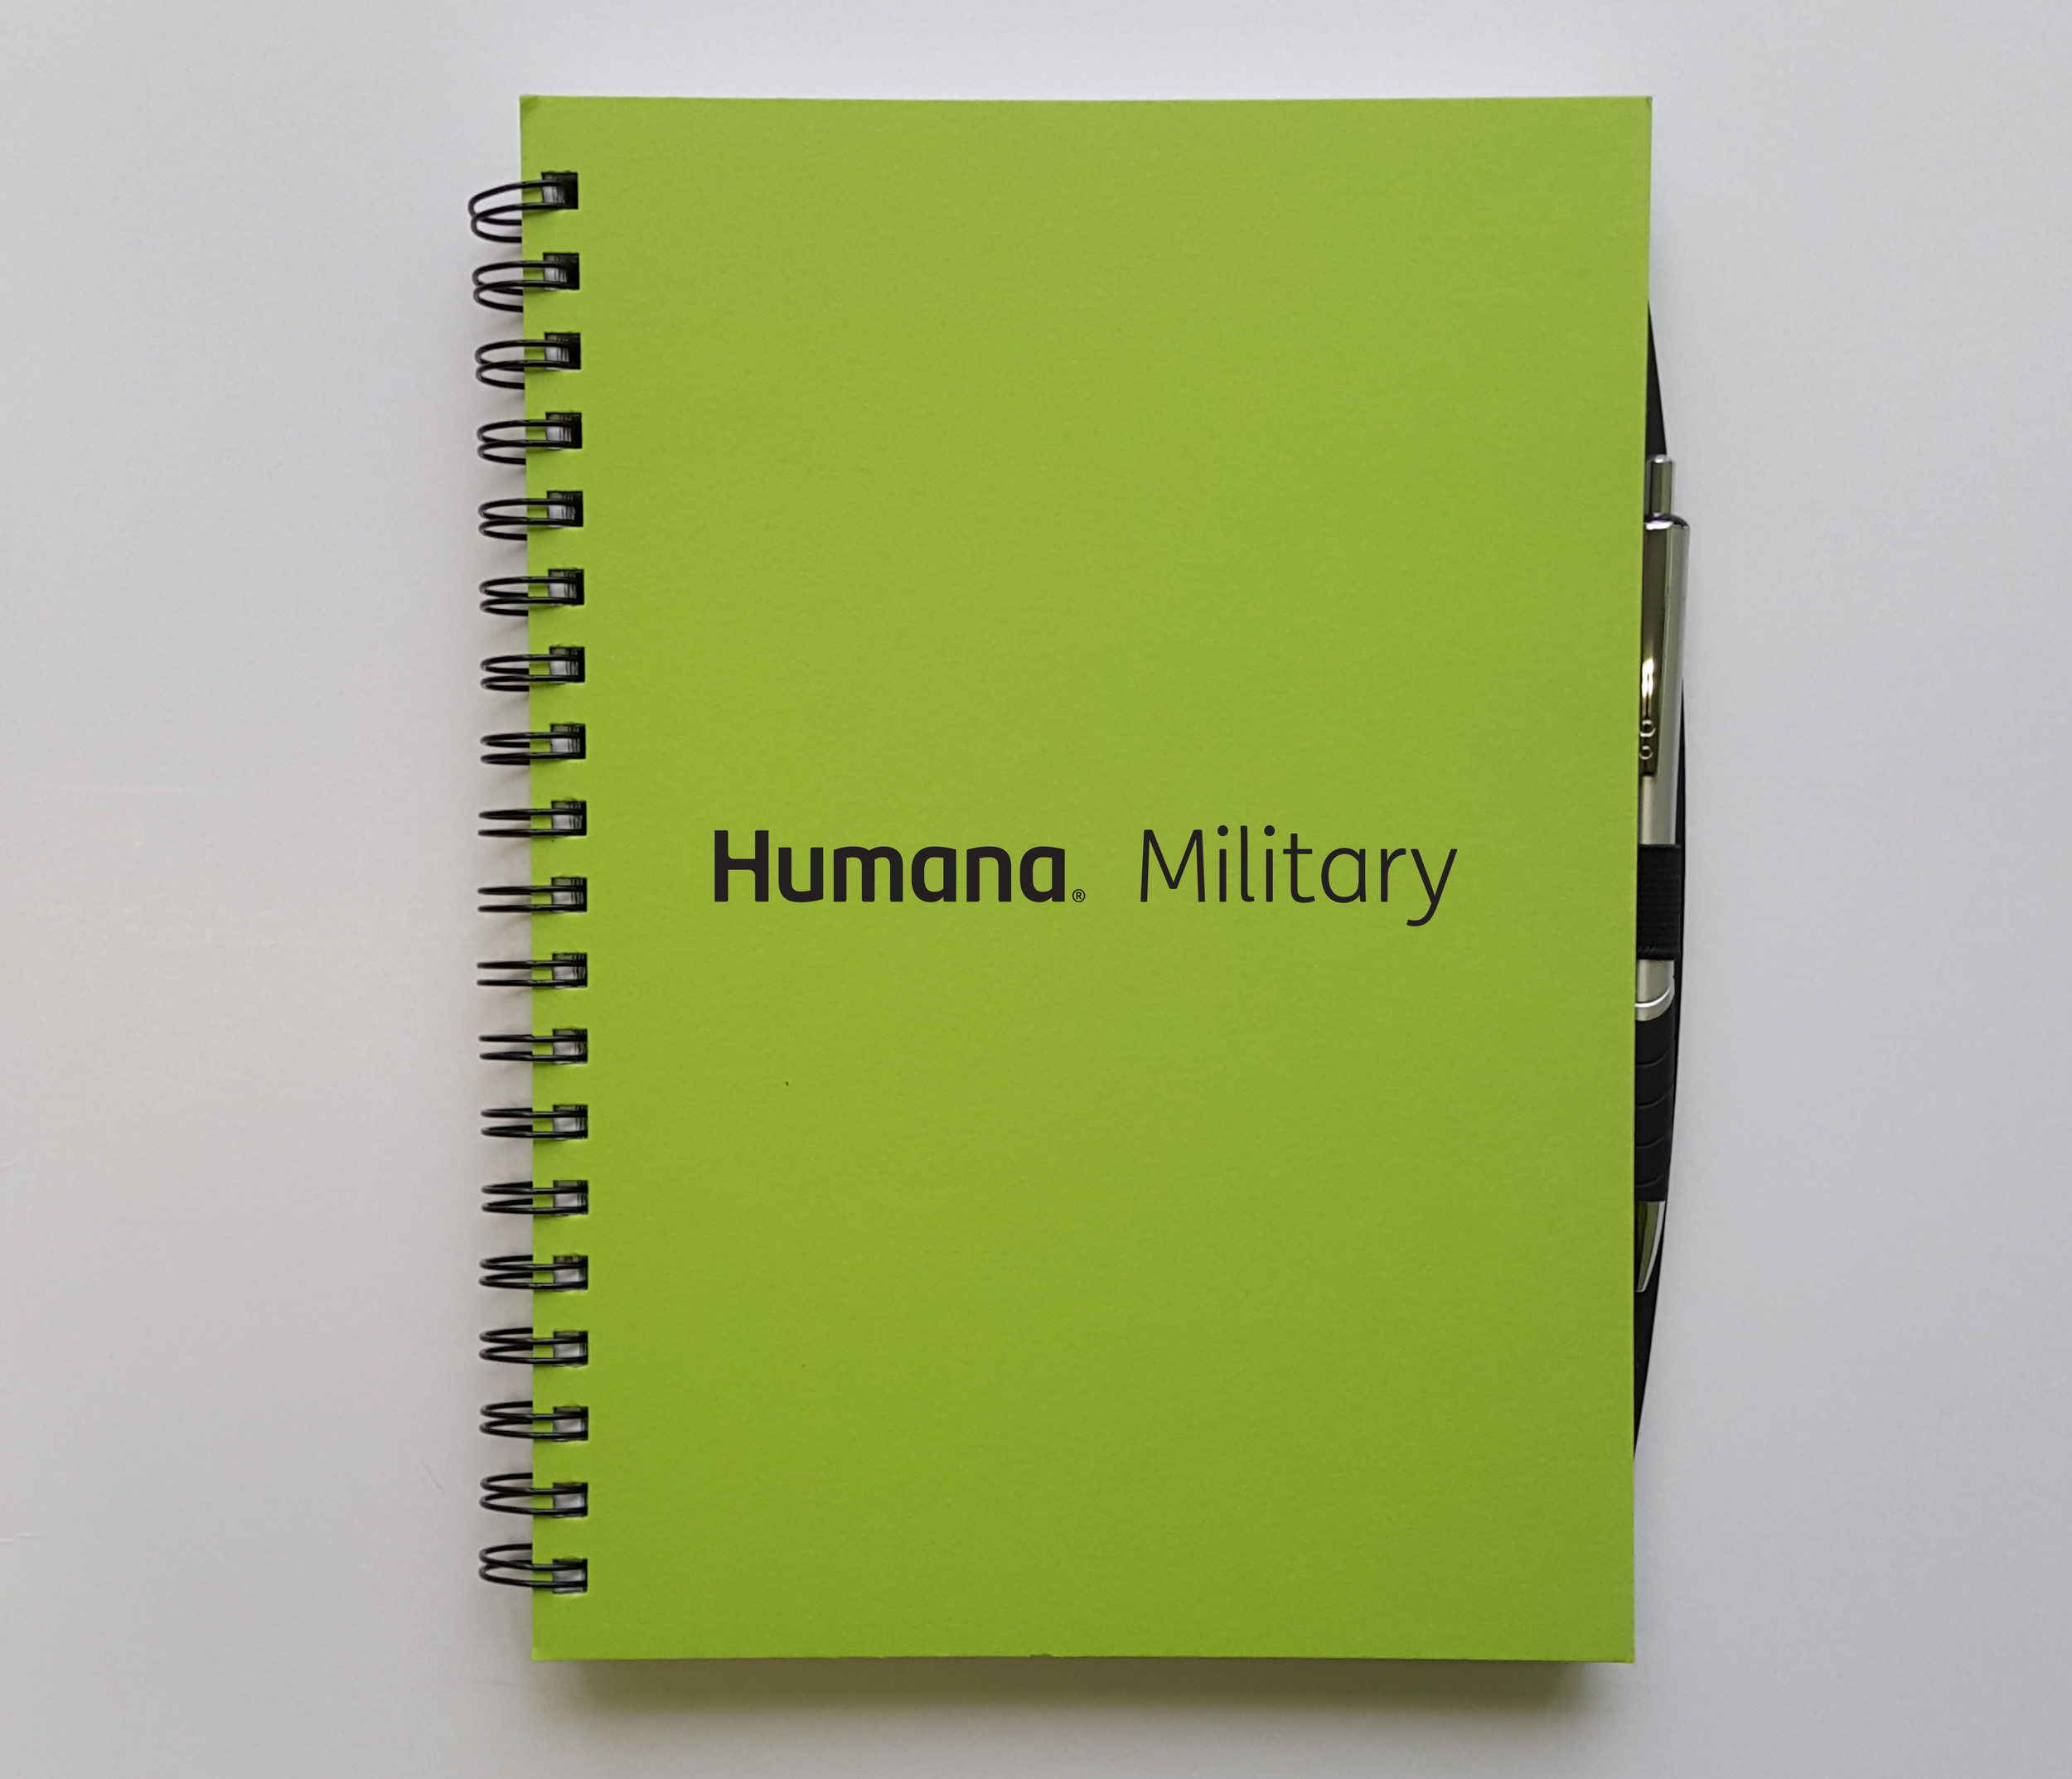 Humana Military Notebook